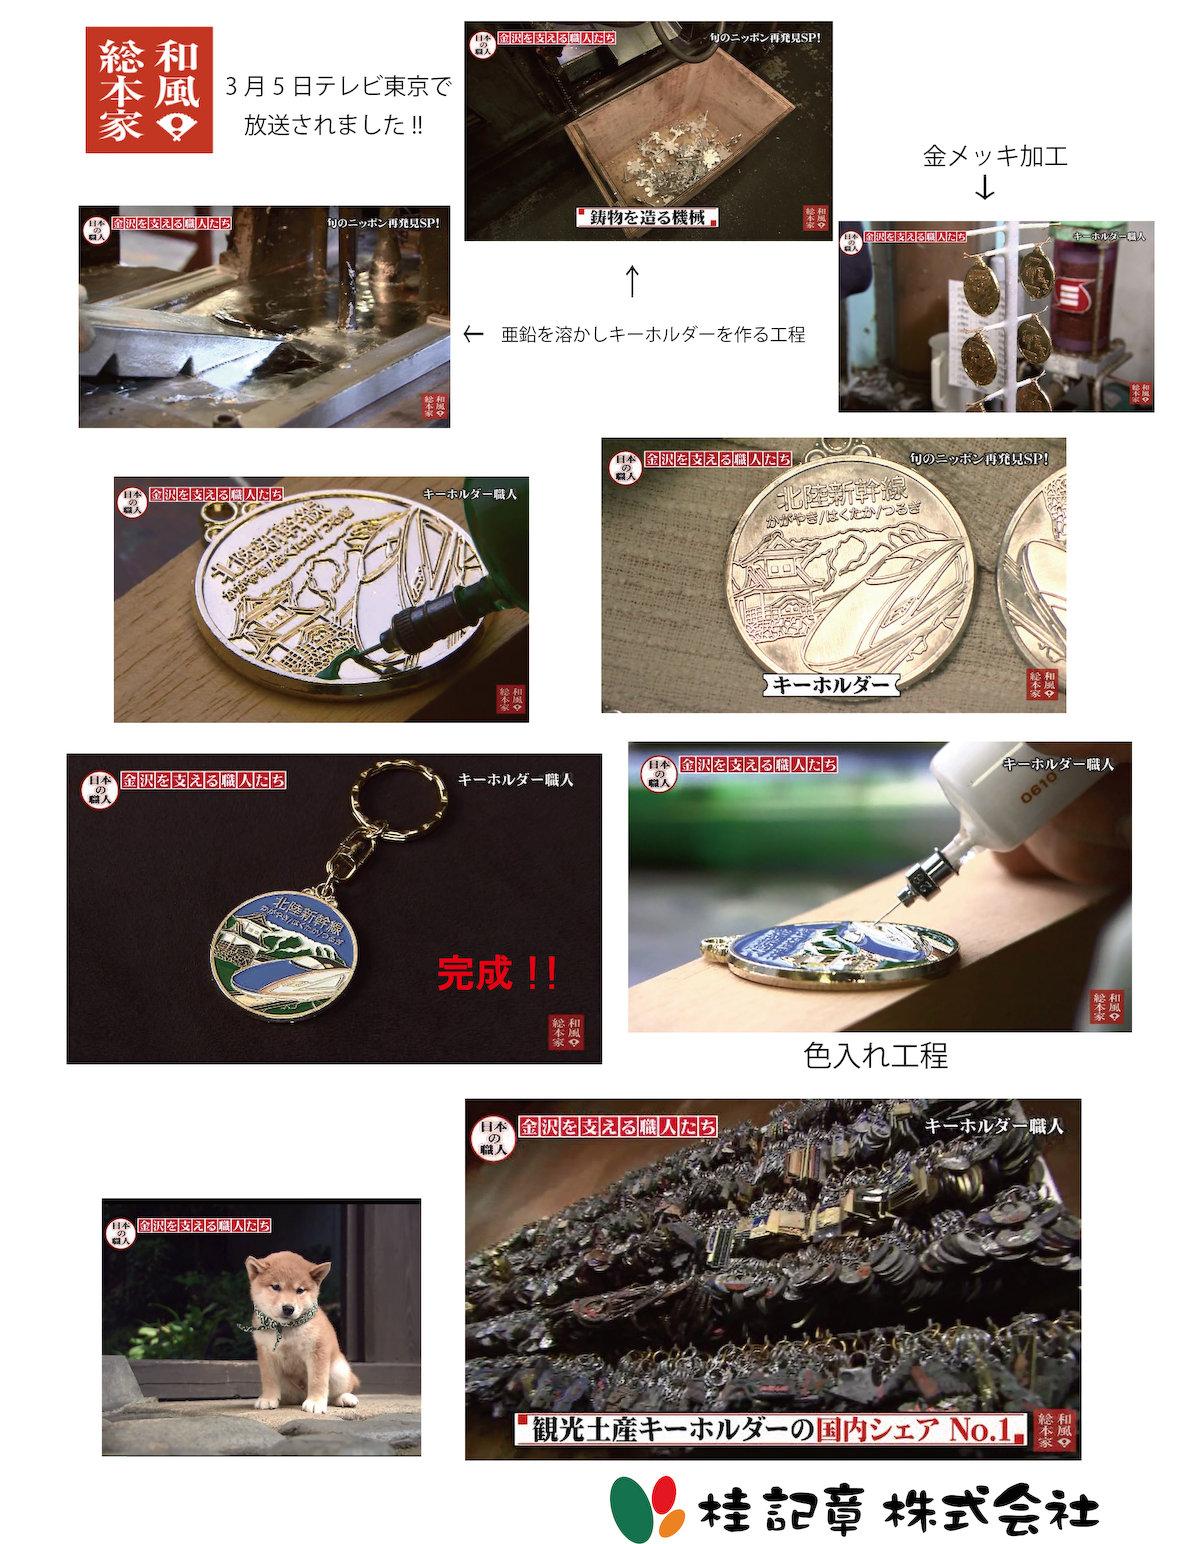 テレビ東京 全国放送 「和風総本家」 放送日2015年3月5日